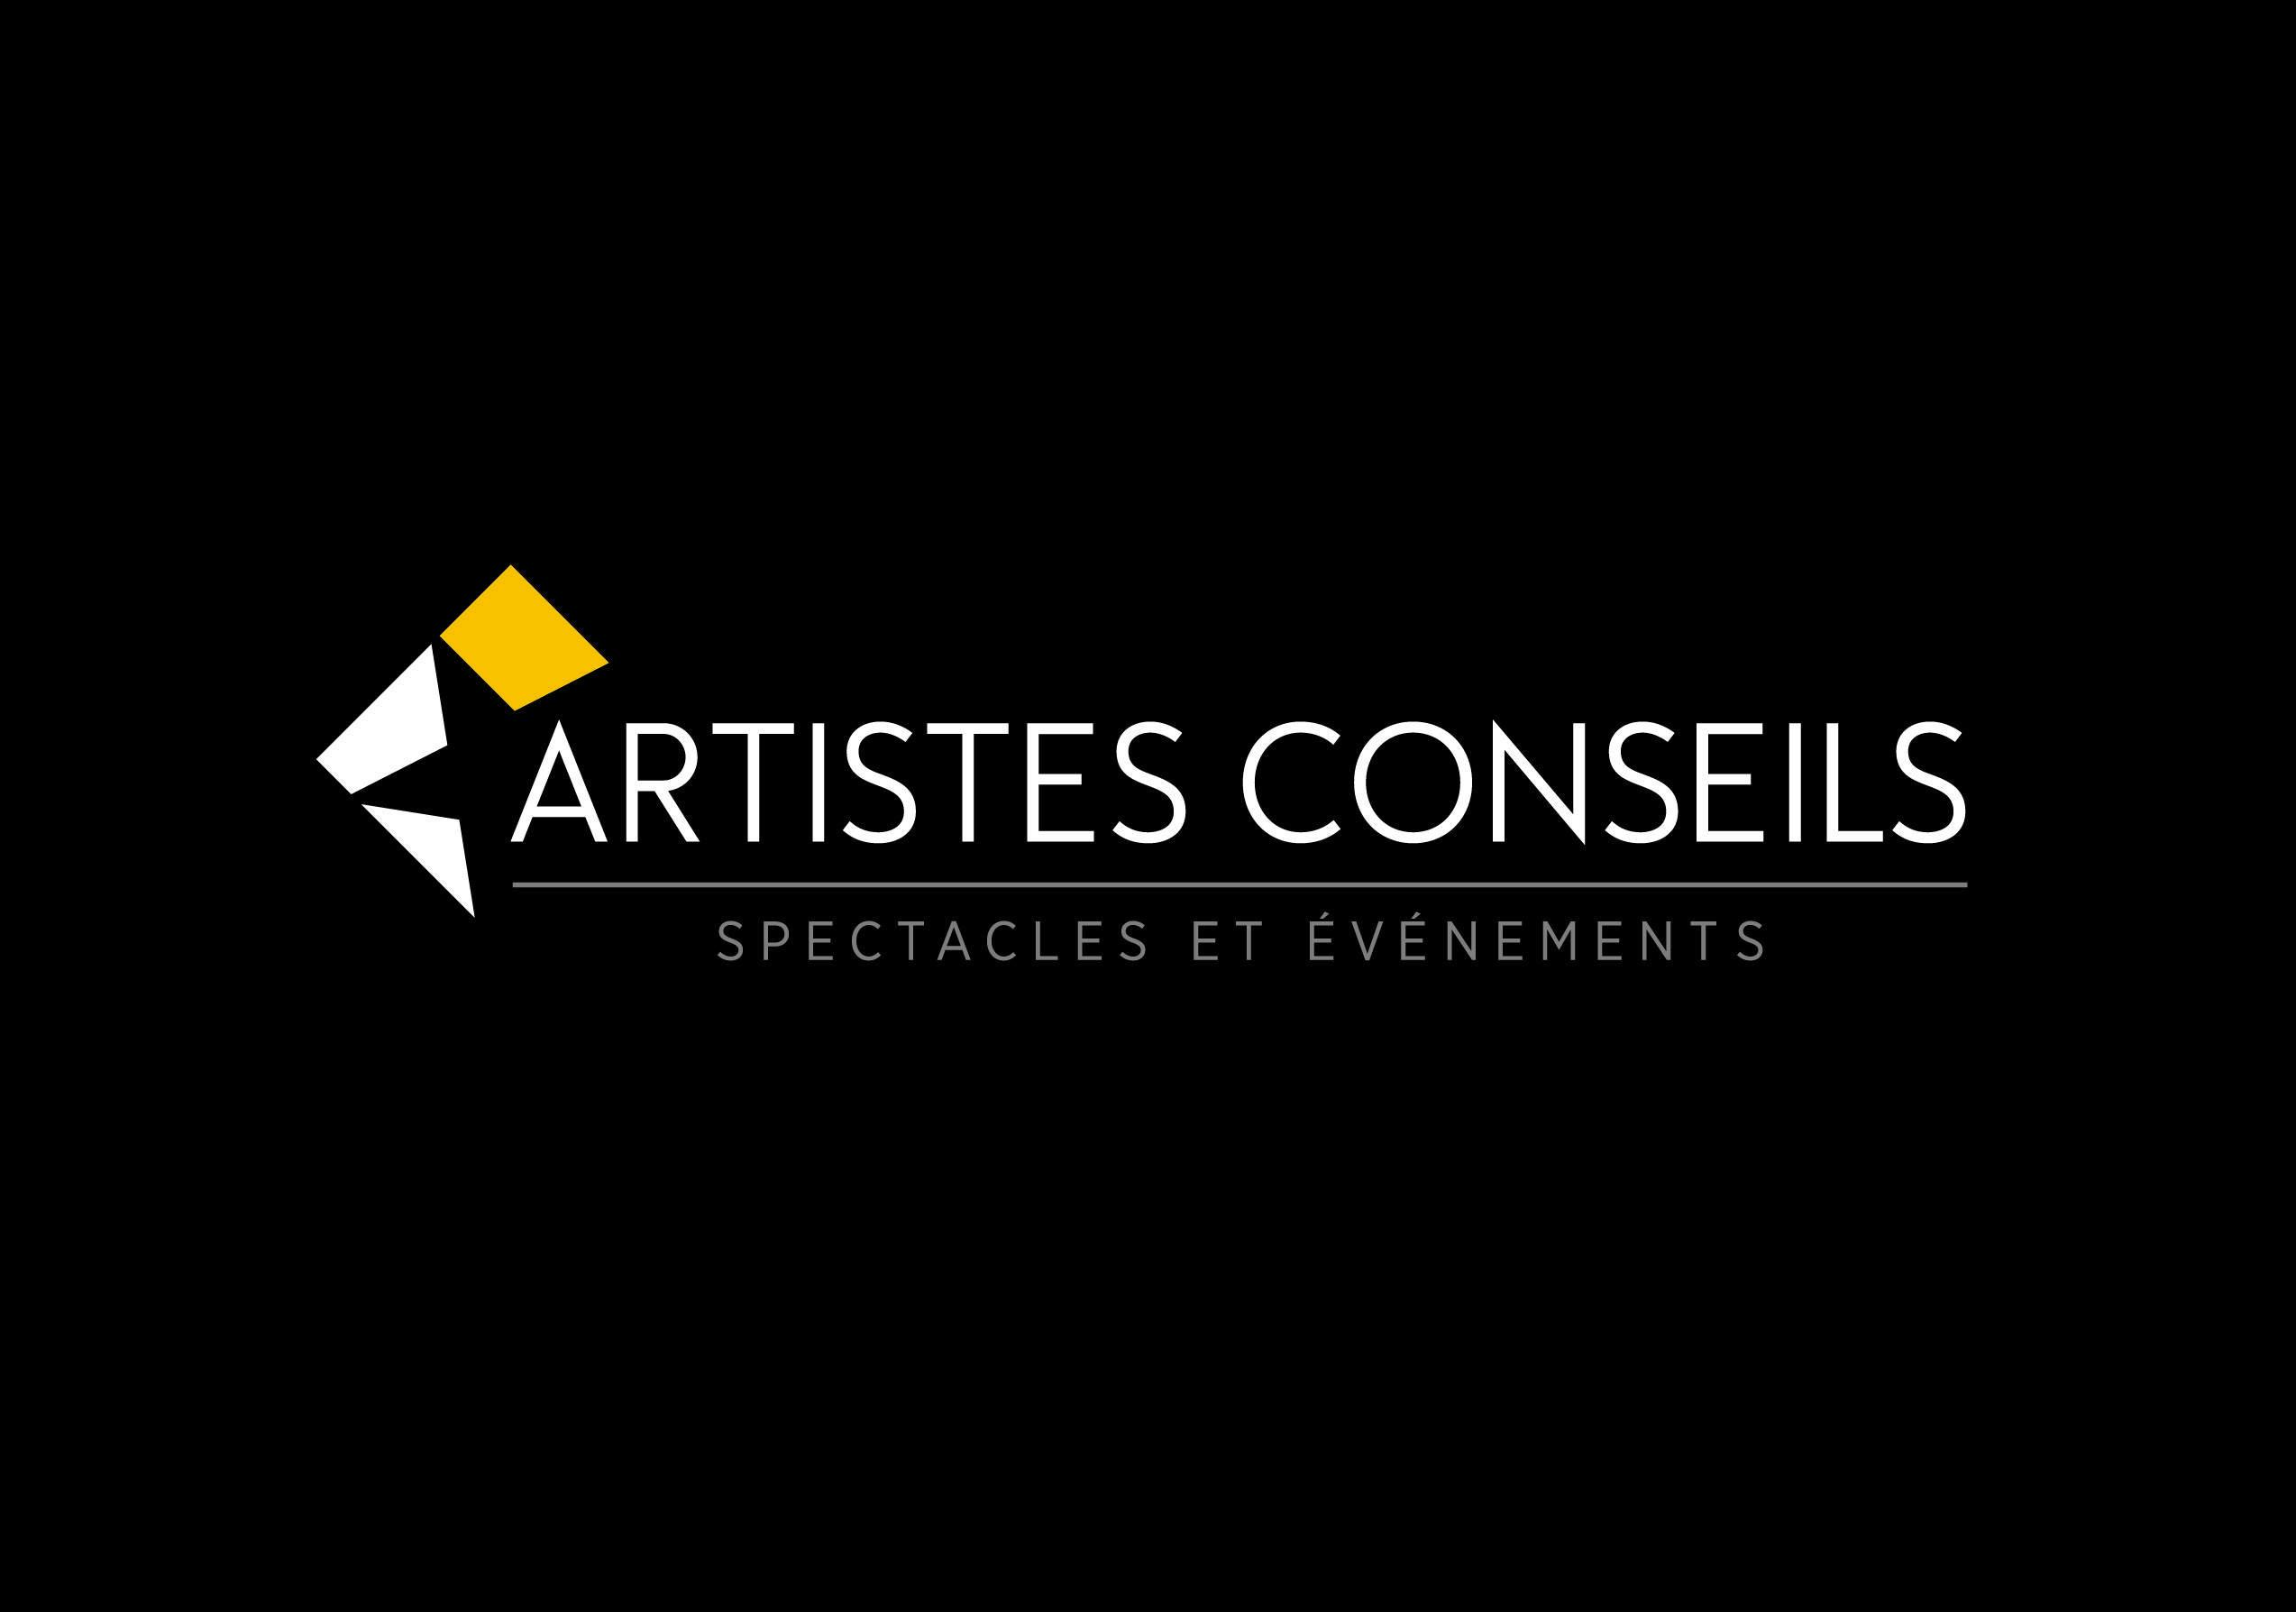 ARTISTES CONSEILS EVENTS - Spectacles - Animations et Evenements